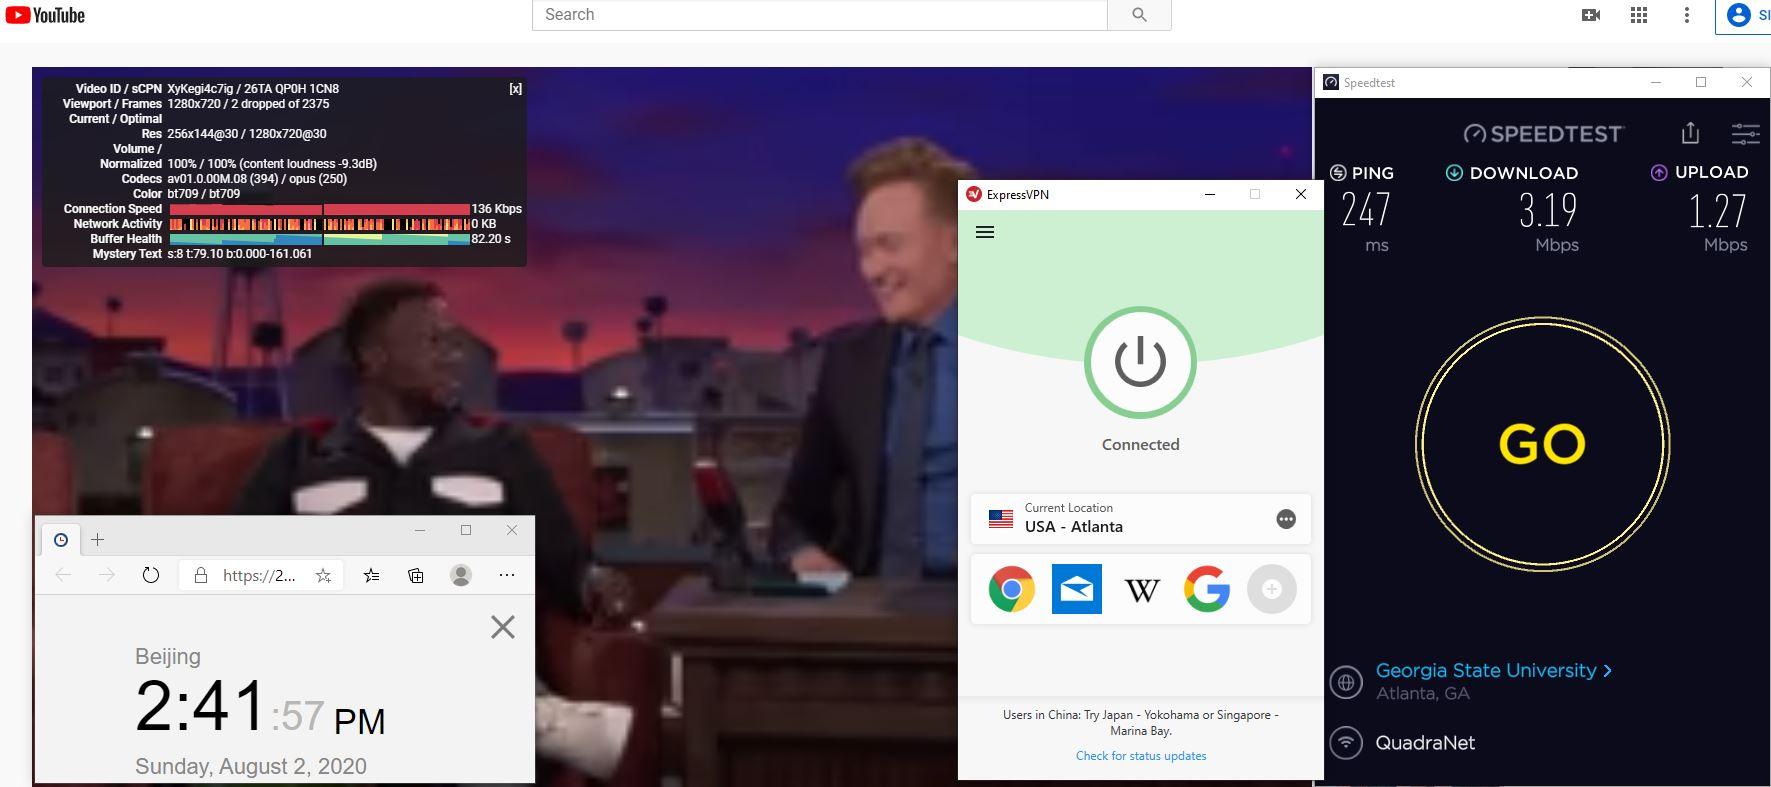 Windows10 ExpressVPN IKEv2协议 USA - Atlanta 中国VPN 翻墙 科学上网 翻墙速度测试 - 20200802